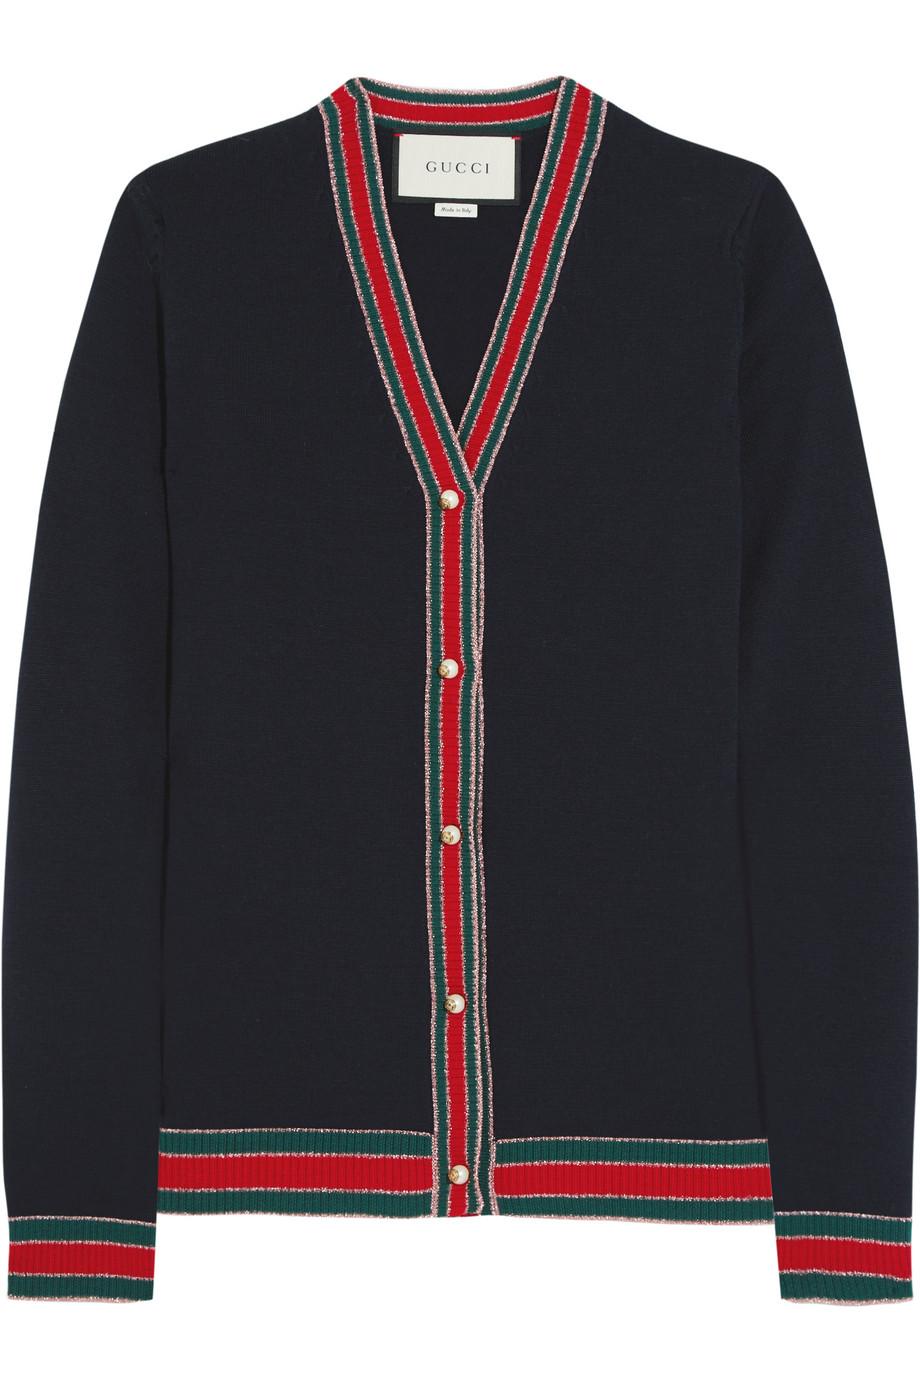 Gucci Striped Wool Cardigan, Navy, Women's, Size: L